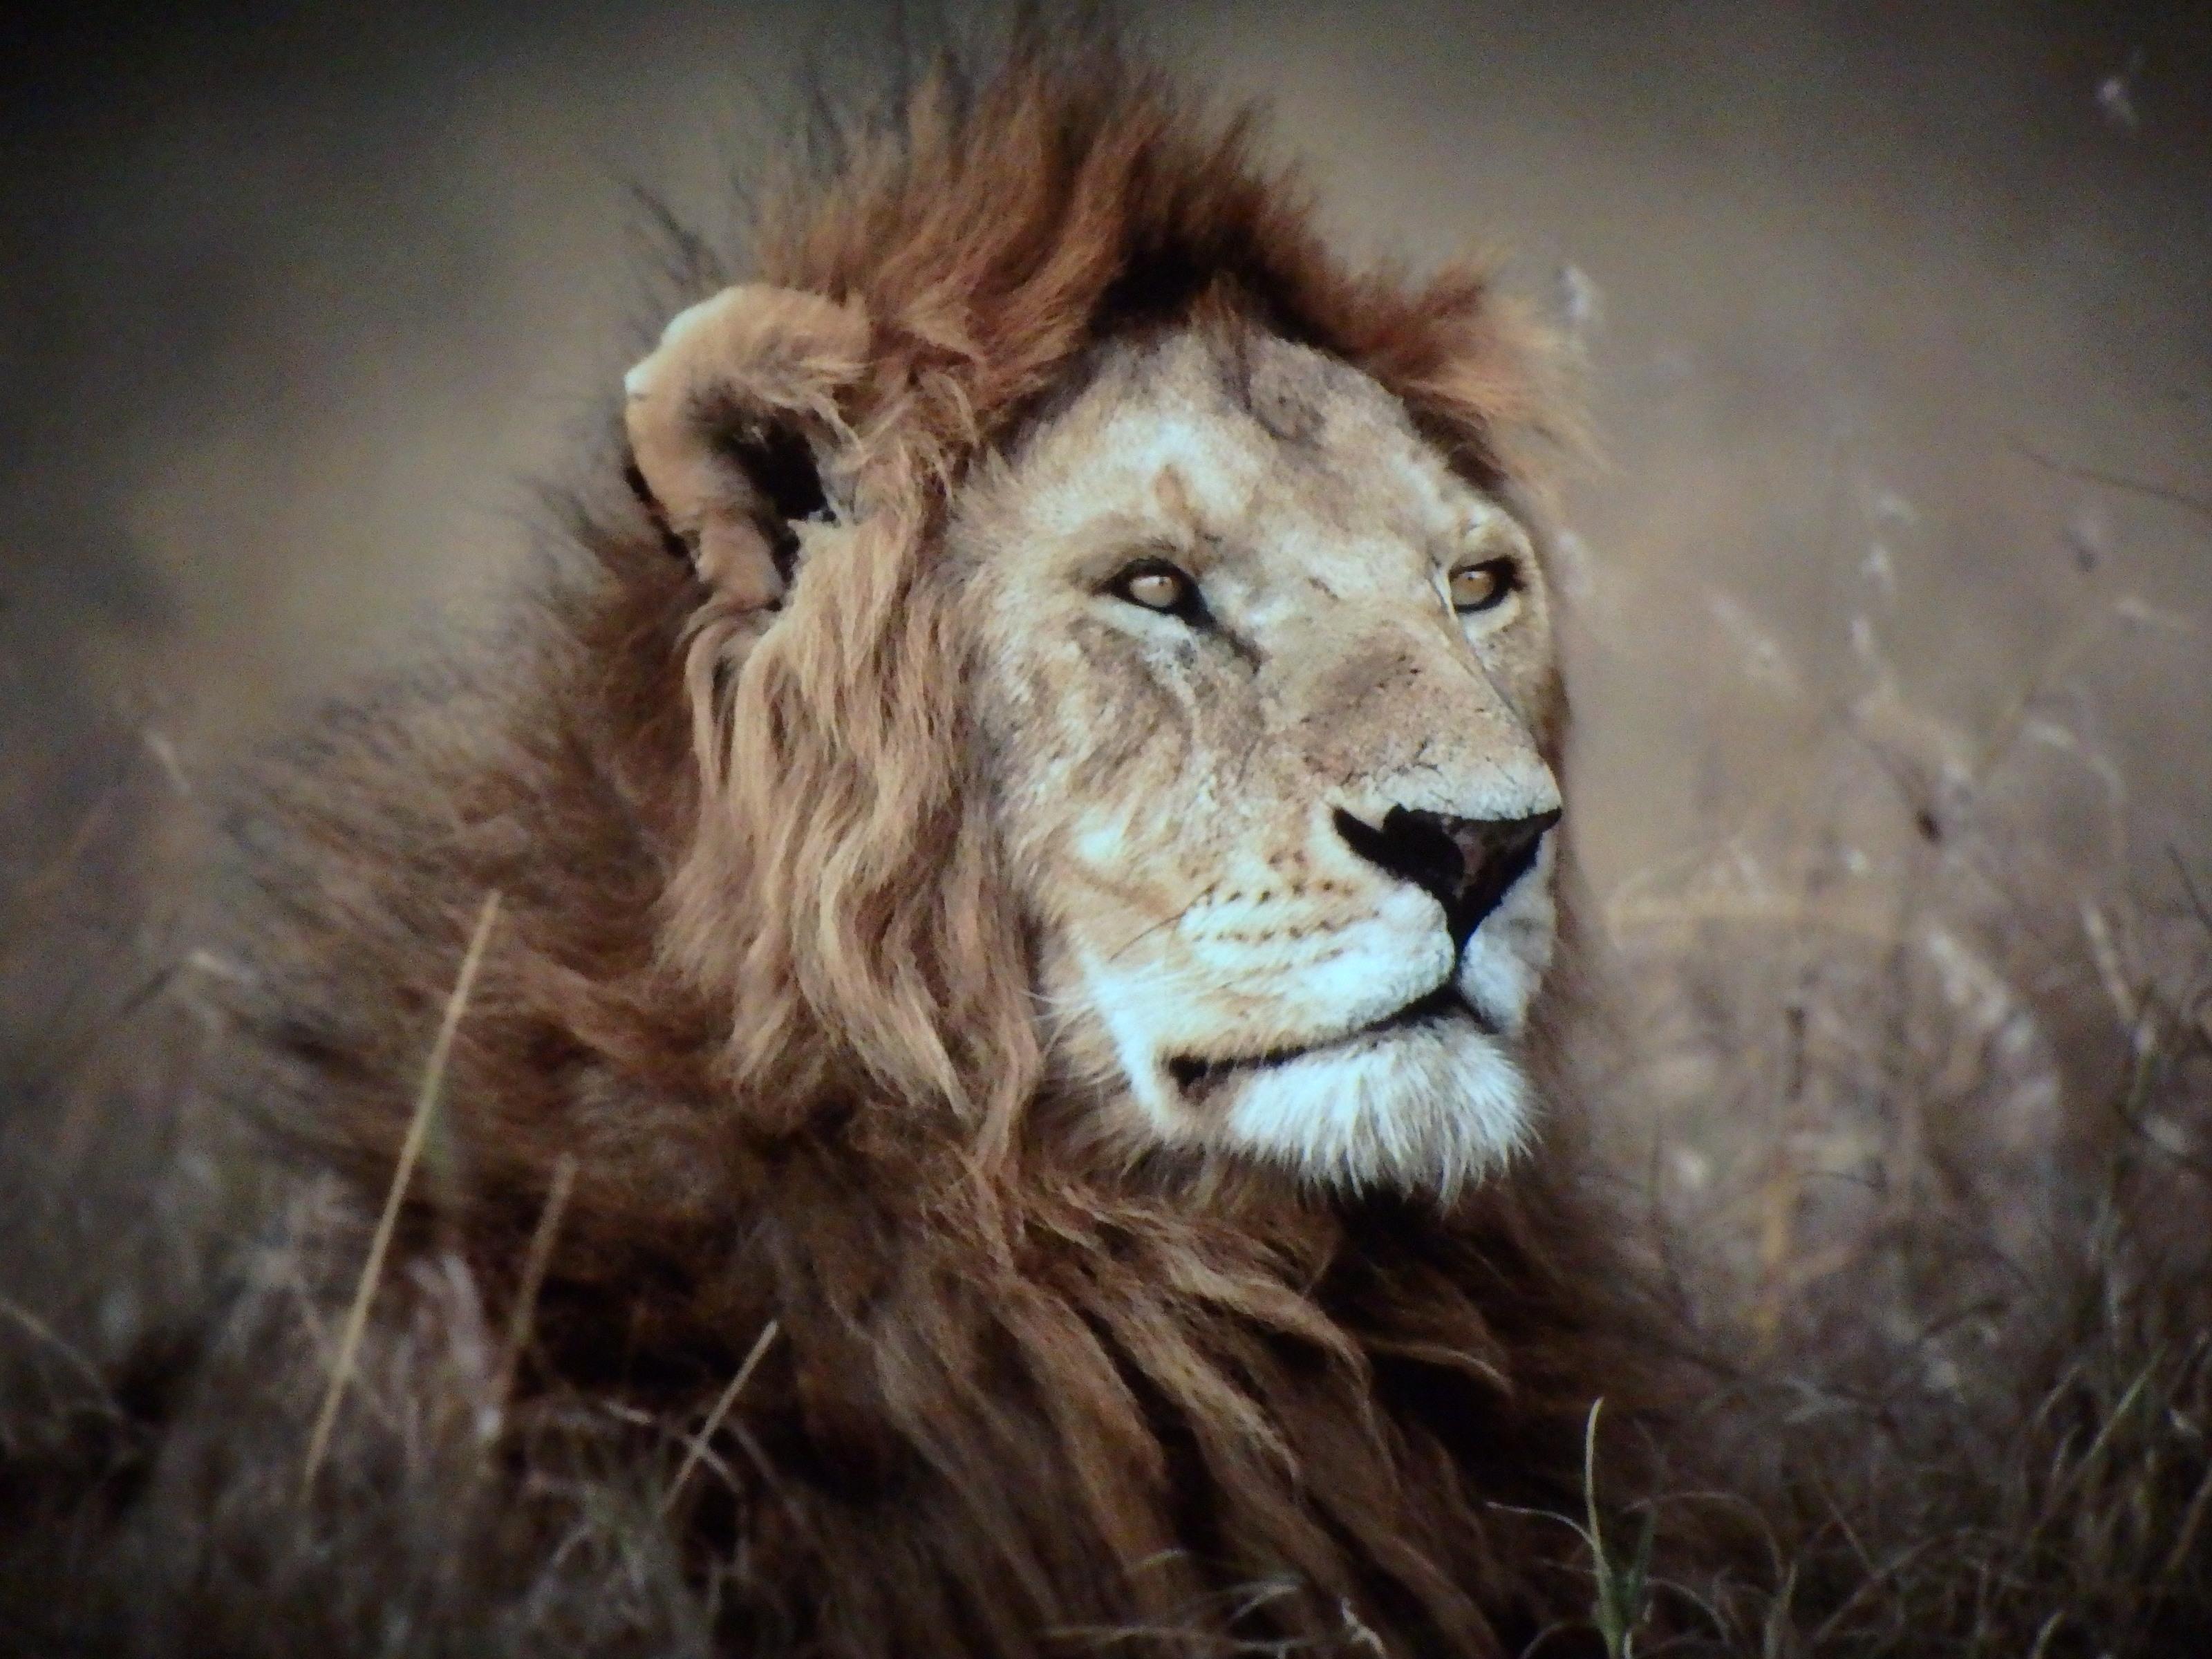 Lejonkungen av Björn Persson - Foto: Belinda Graham